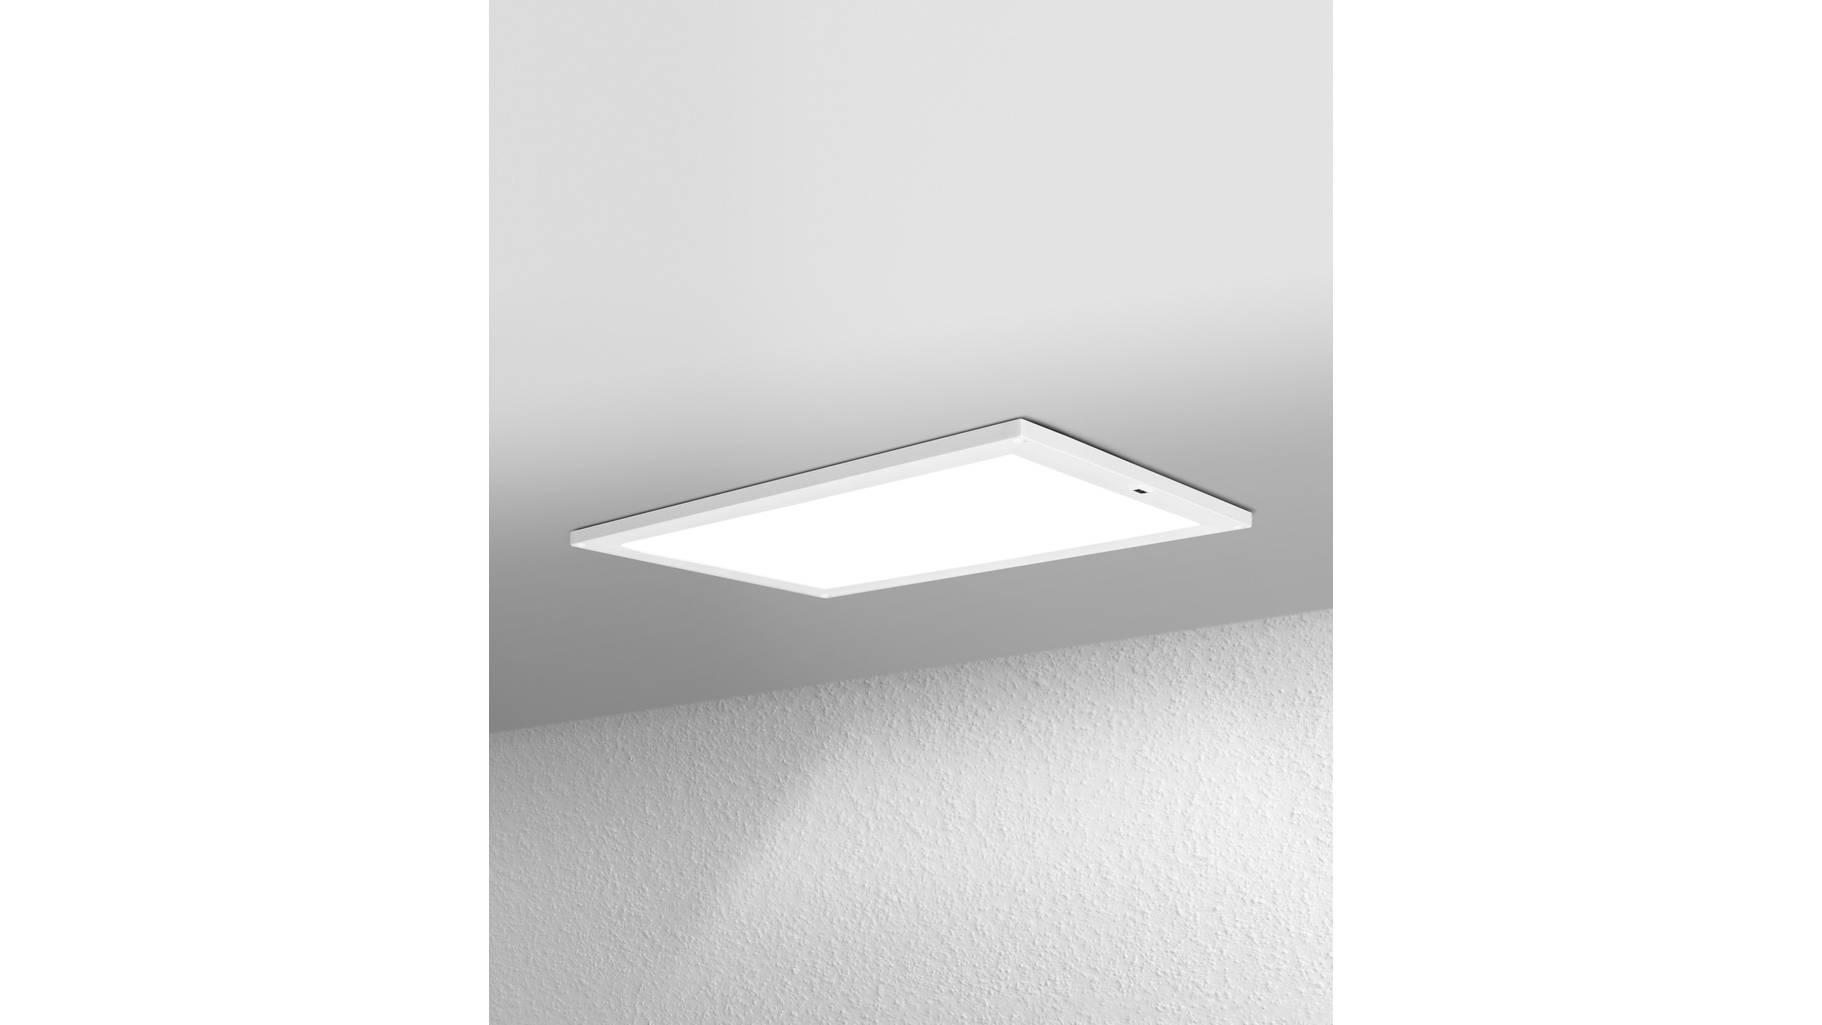 Full Size of Osram Planon Pure Led Panel Light 1200x300 60x60 Surface Mount Kit (1200 X 300mm) Frameless 600x600mm 300x600mm Plus 1200x300mm 600 4058075126404 Cabinet Wohnzimmer Osram Led Panel